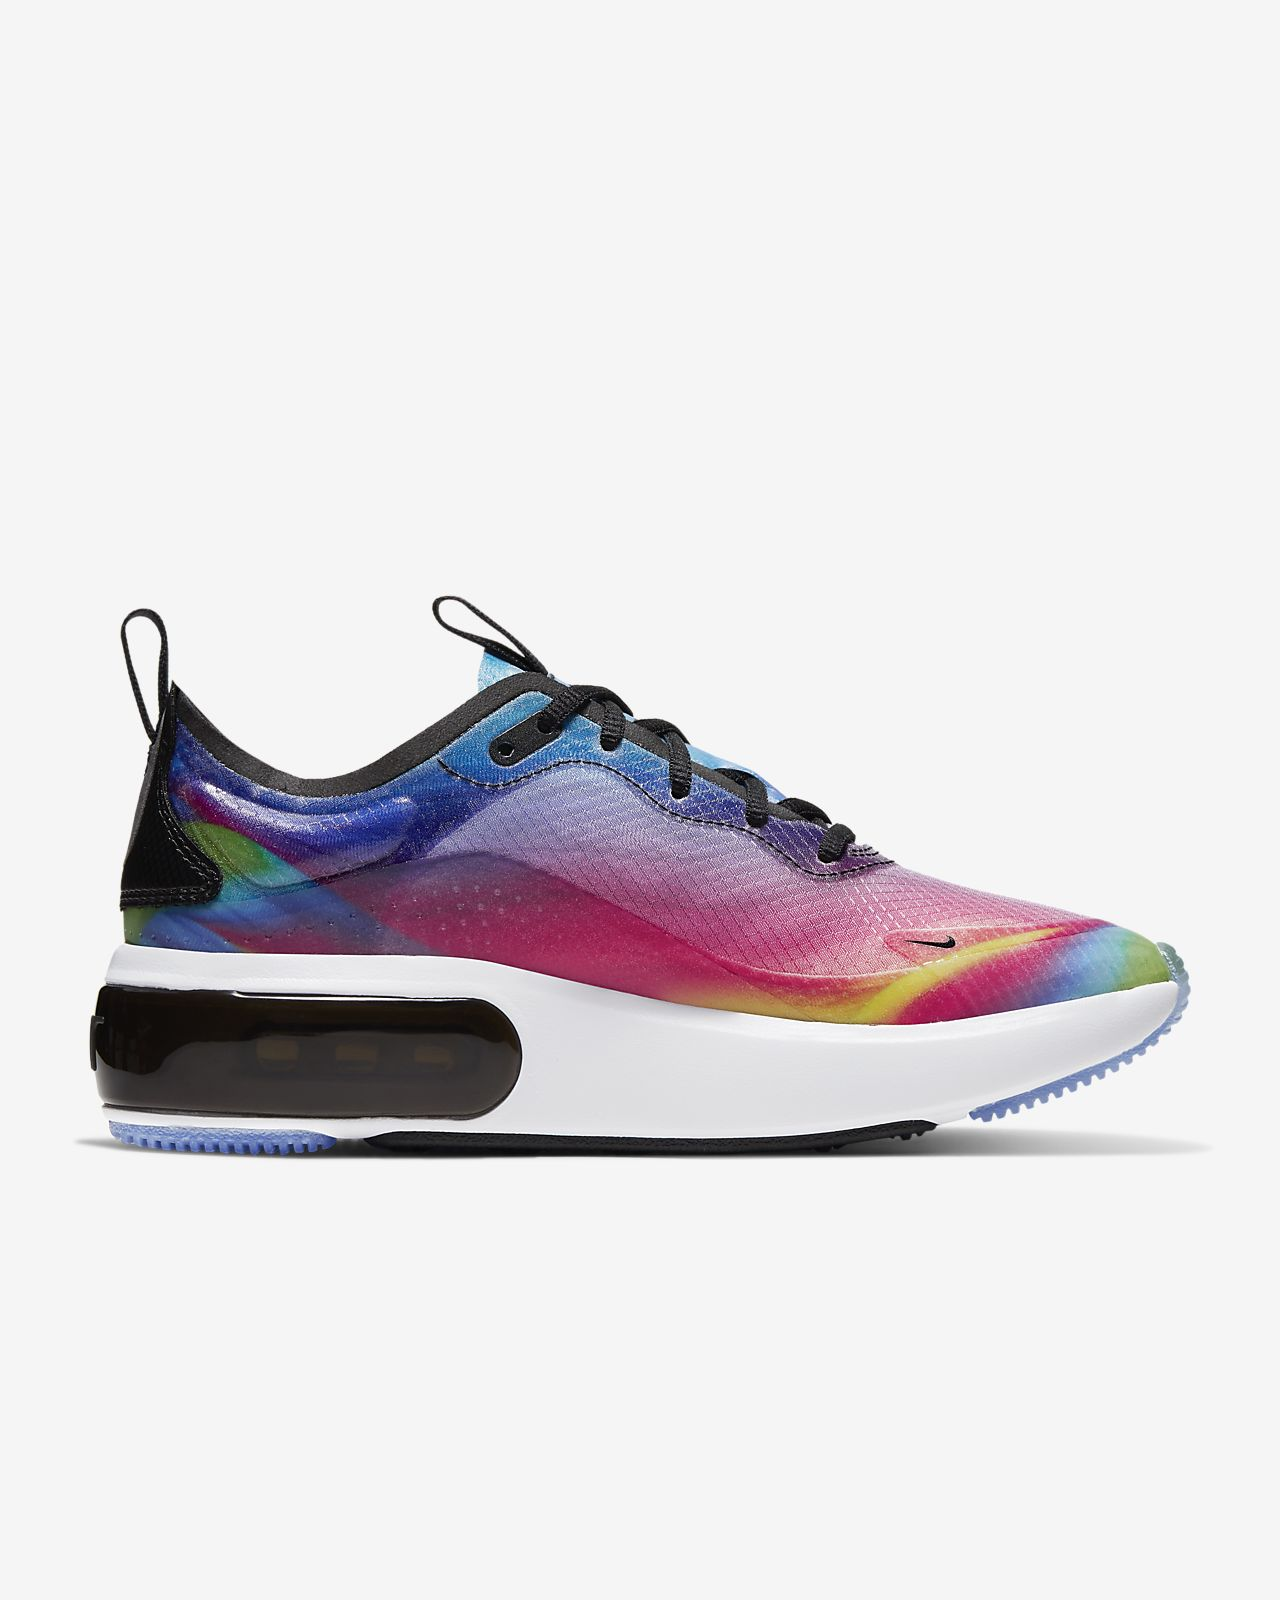 Nike Air Max Dia NRG Women's Shoe